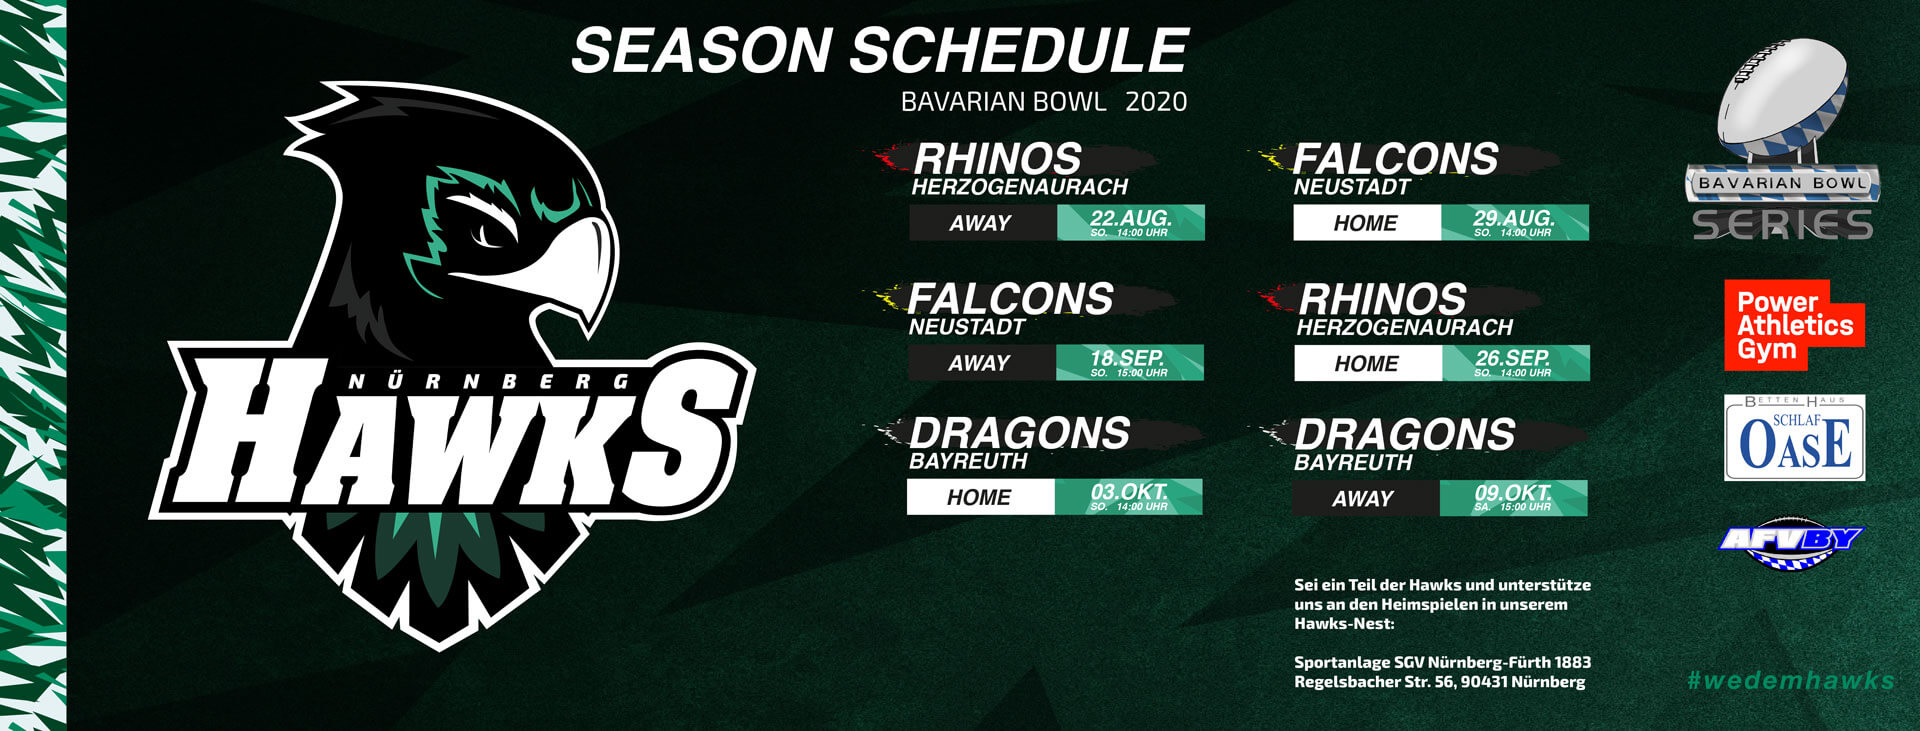 season-schedule-21